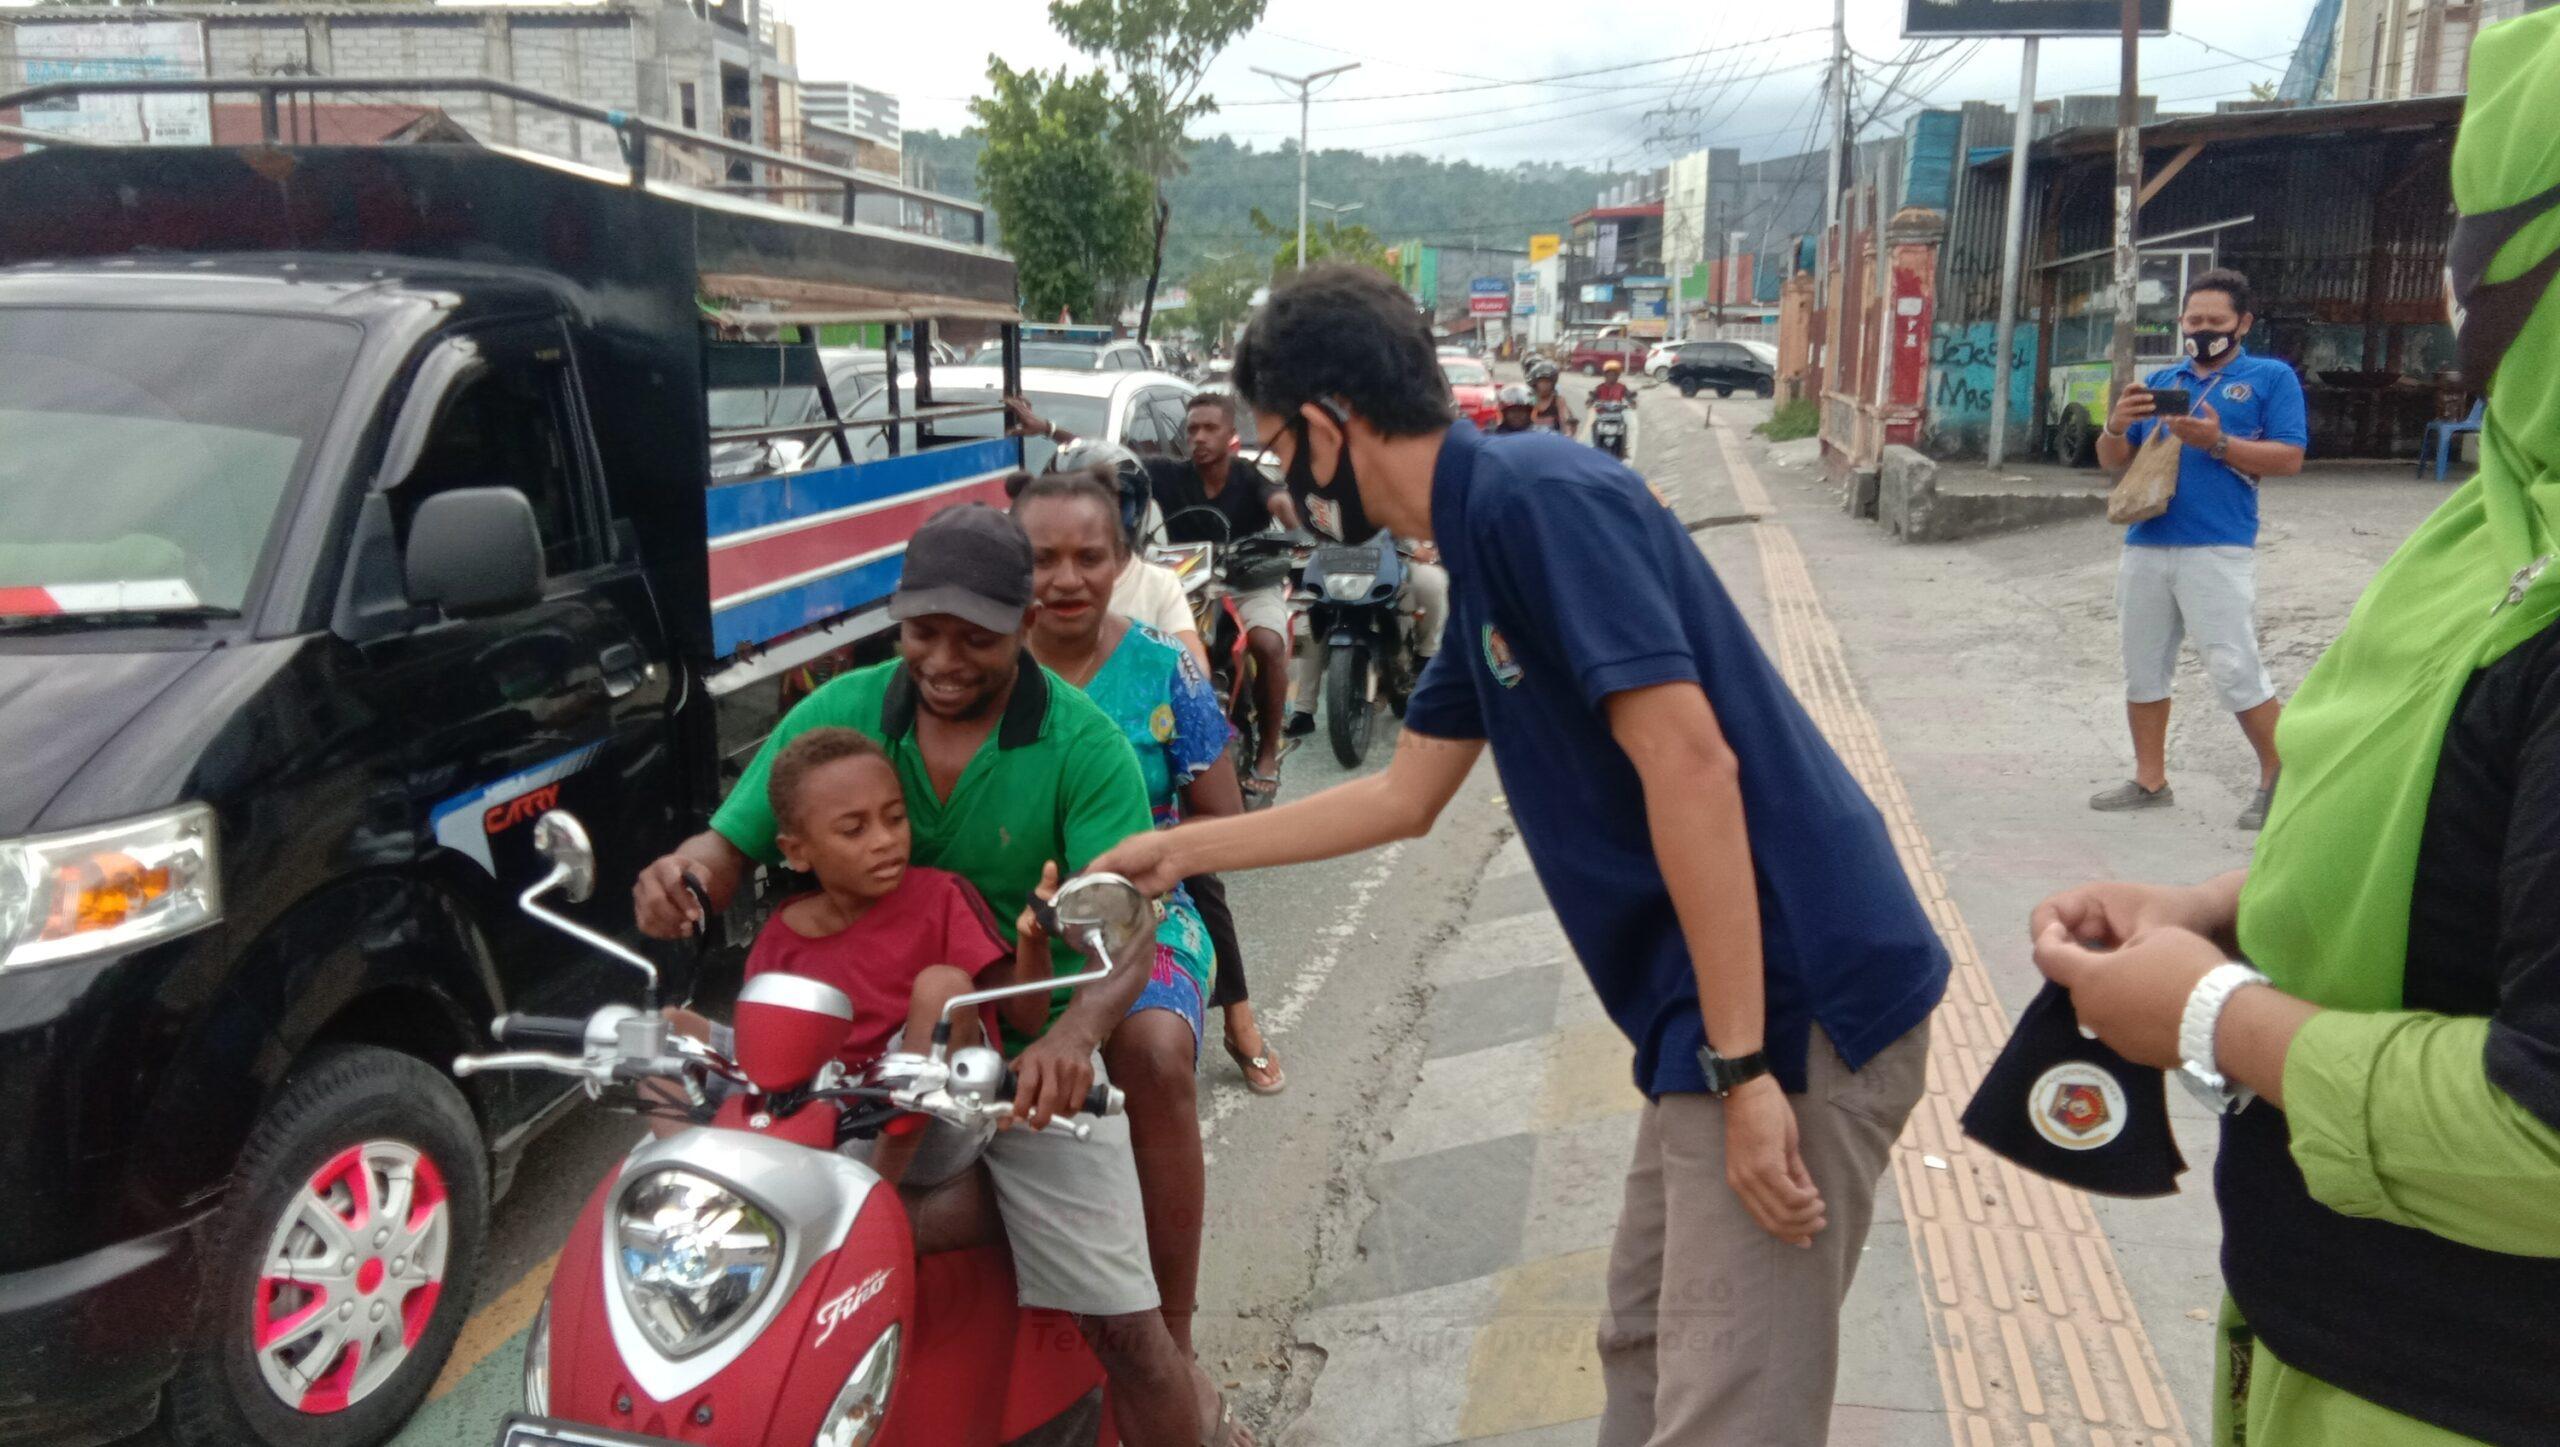 PWI Papua Barat Bagi 1000 Masker di Manokwari 24 IMG 20210207 WA0108 1 scaled